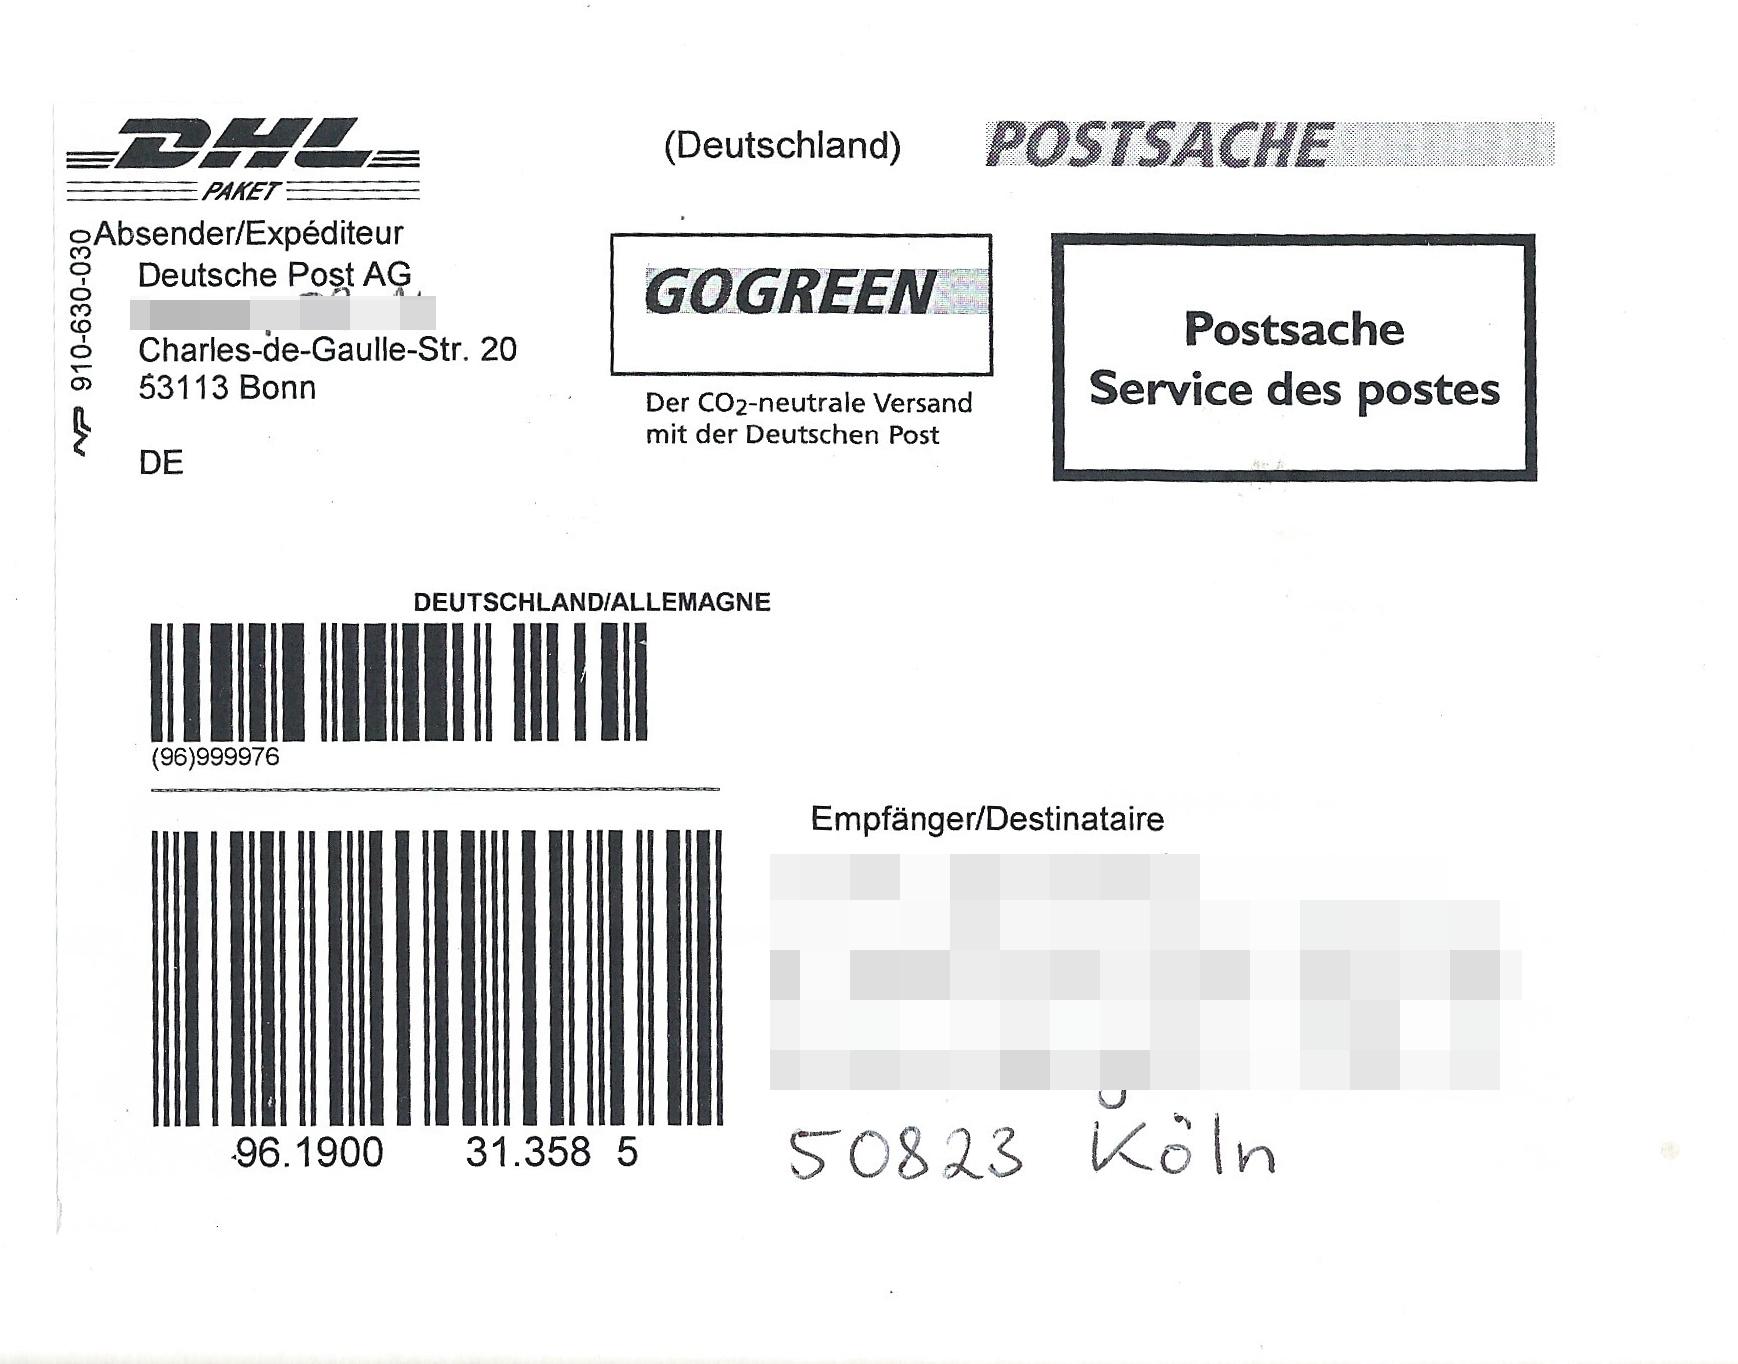 File:Paketaufkleber DHL als Postsache 2015.jpg - Wikimedia Commons